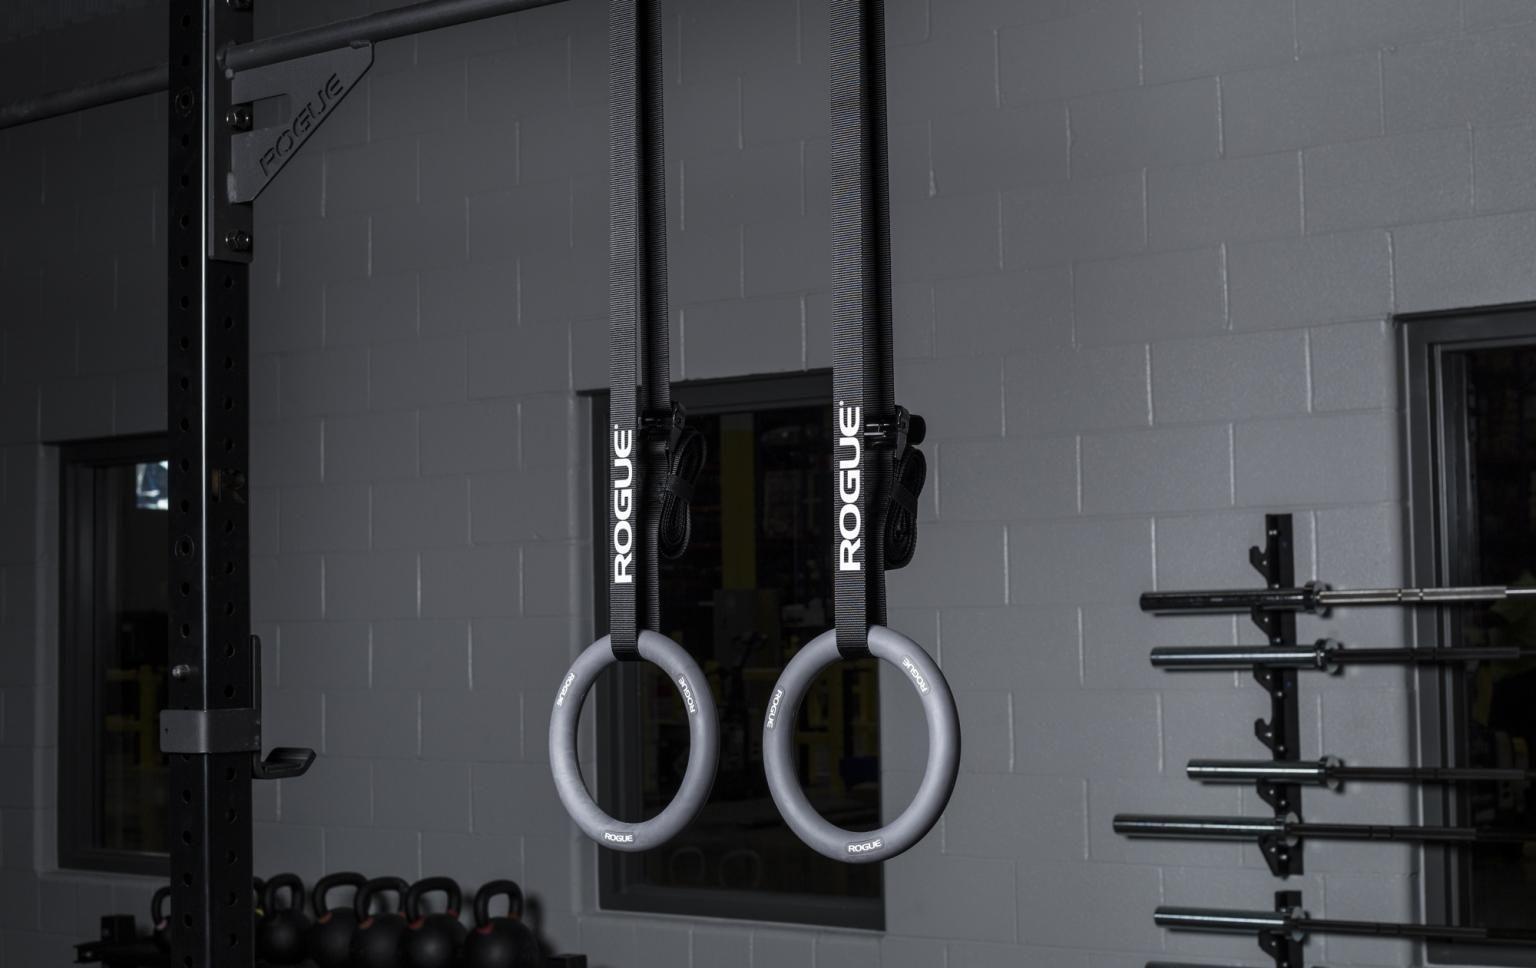 Garage gym reviews skierg concept skierg cardio